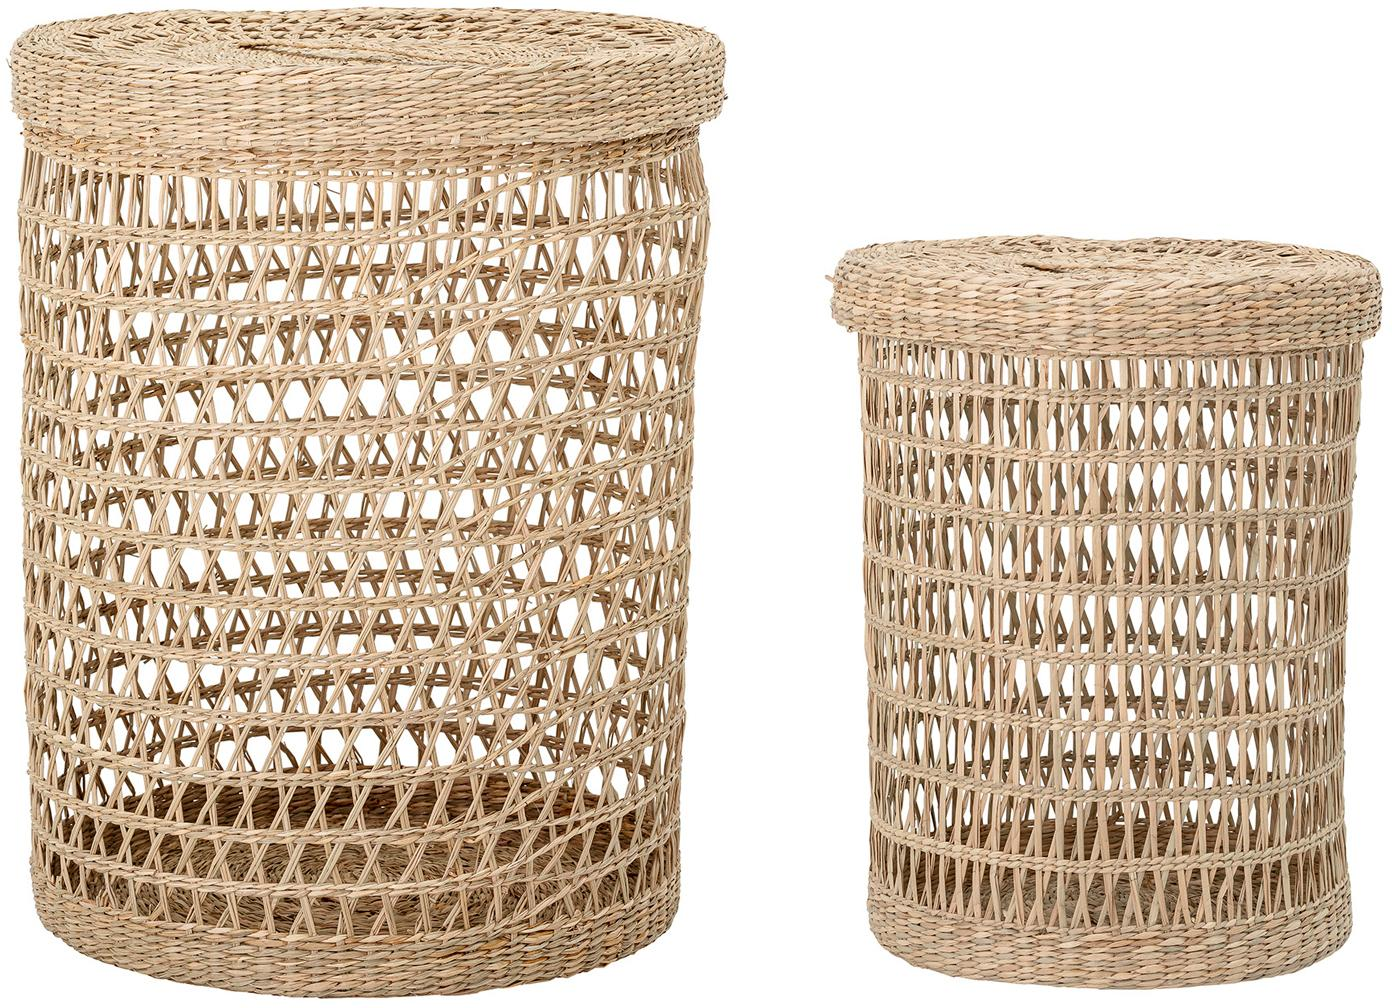 Set de cestas Beta, Fibra natural, Beige, Set de diferentes tamaños